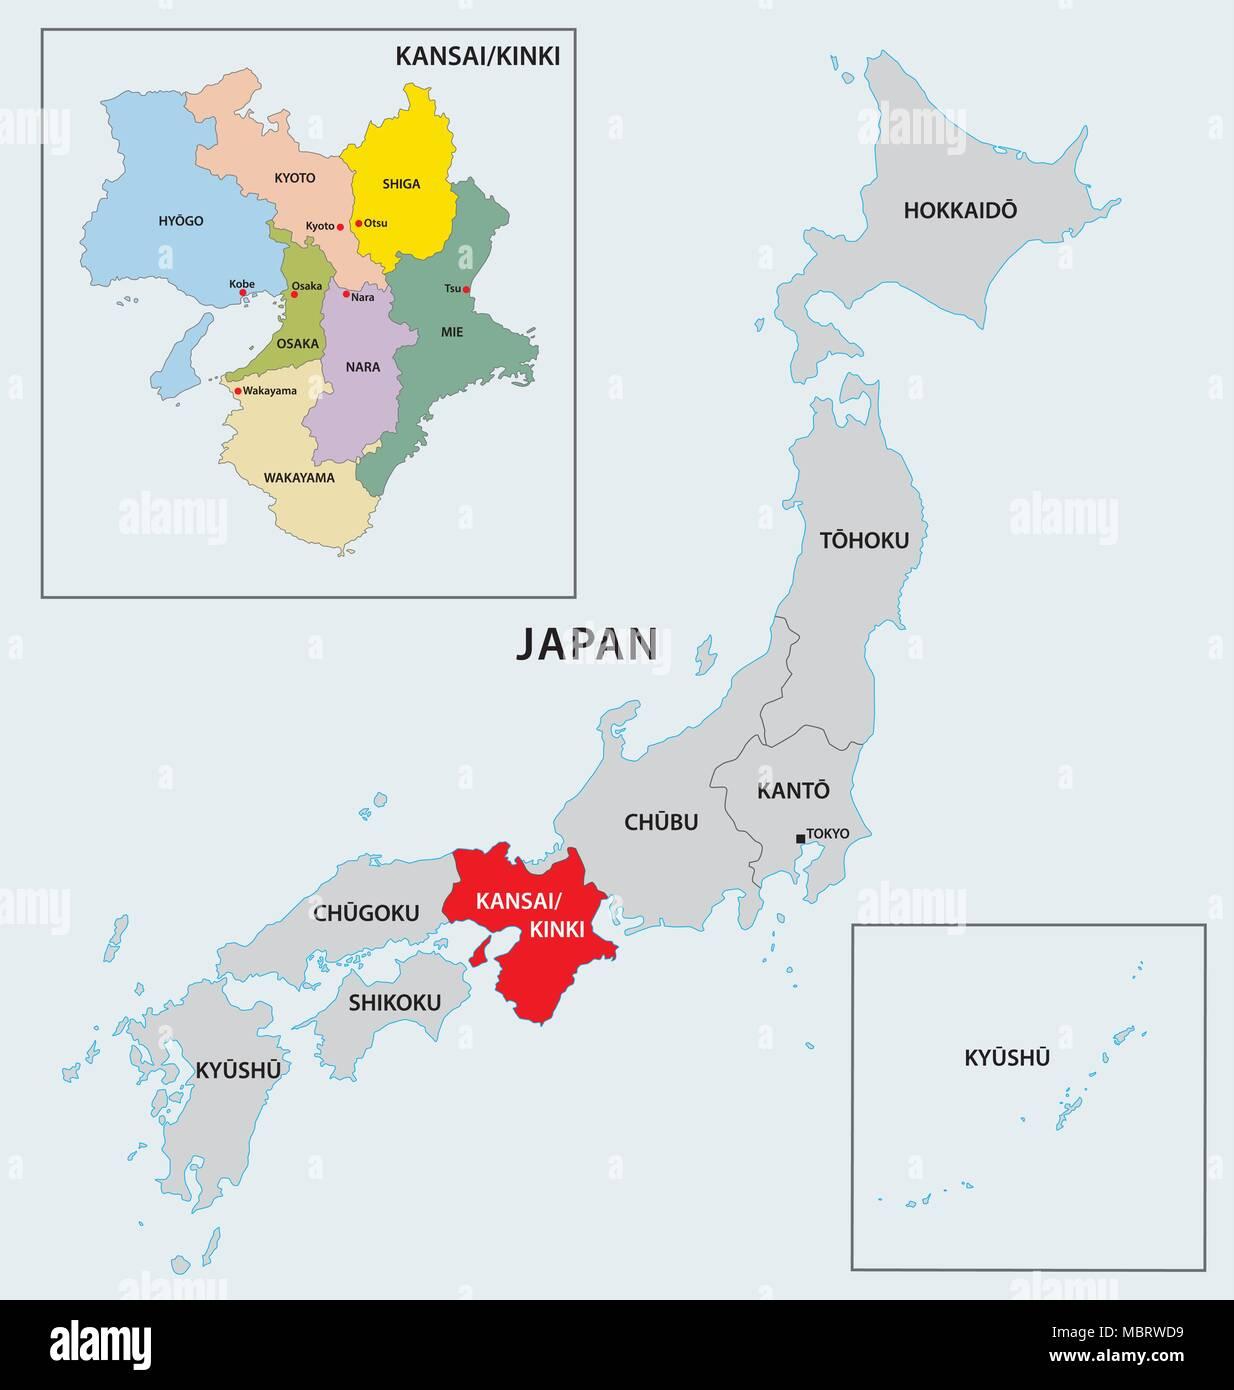 japan region kinki map - Stock Image